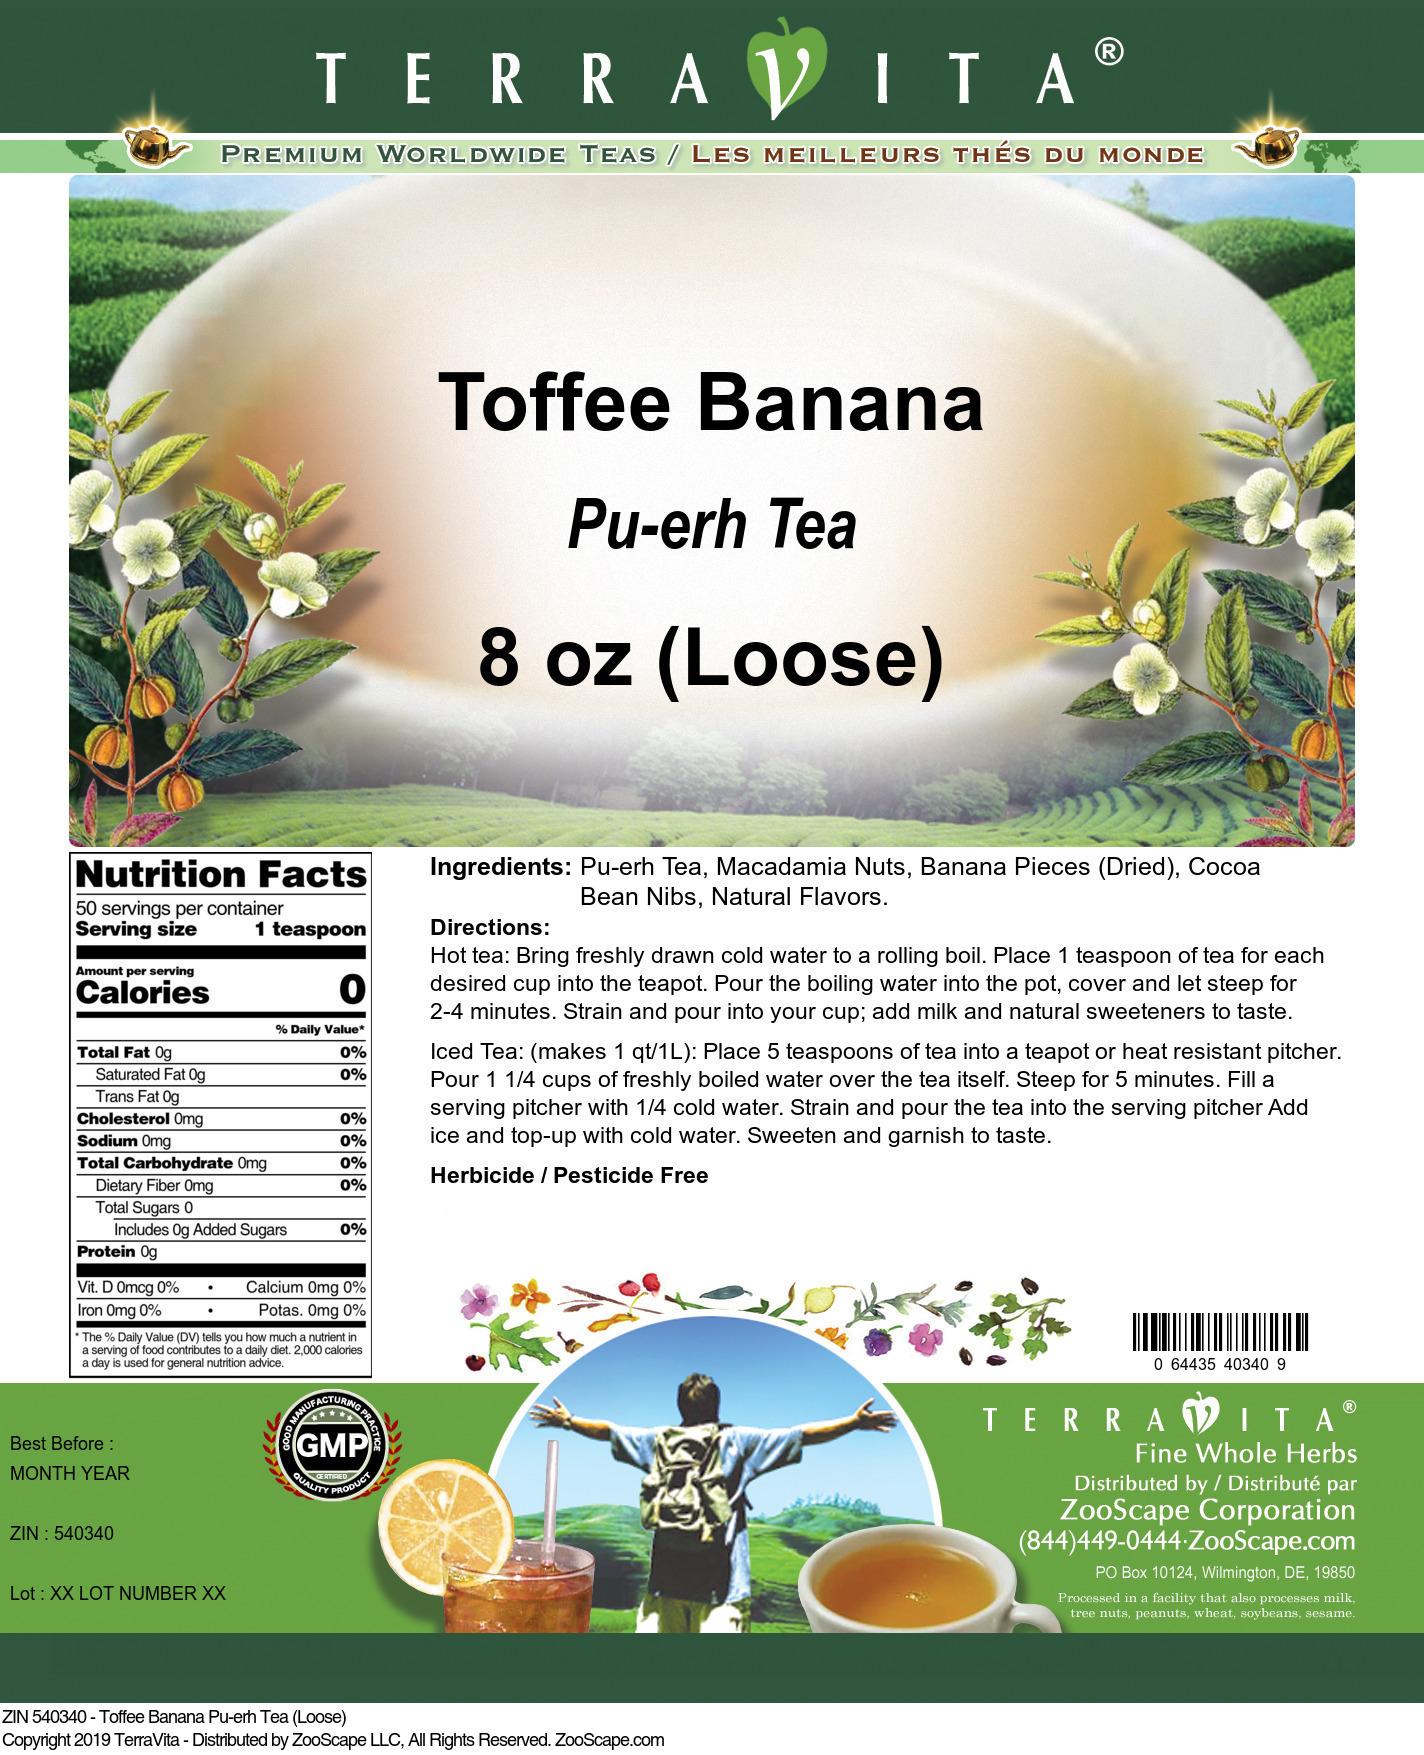 Toffee Banana Pu-erh Tea (Loose)